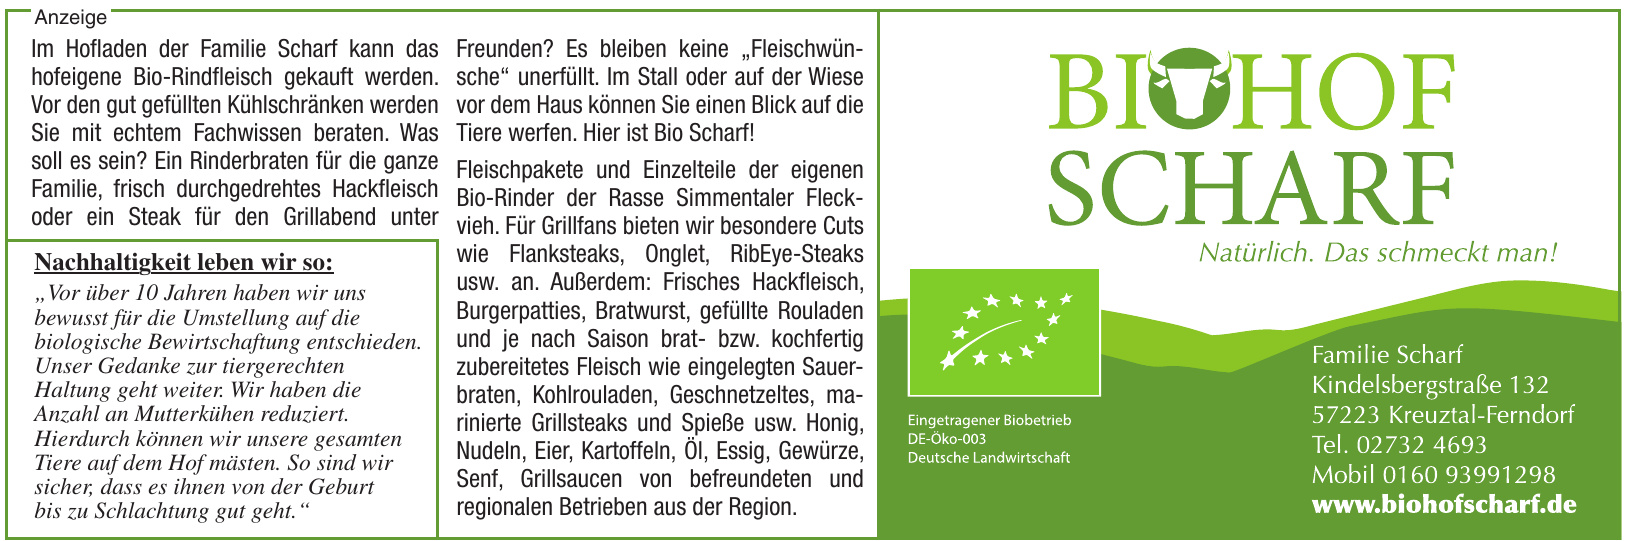 Biohof Scharf